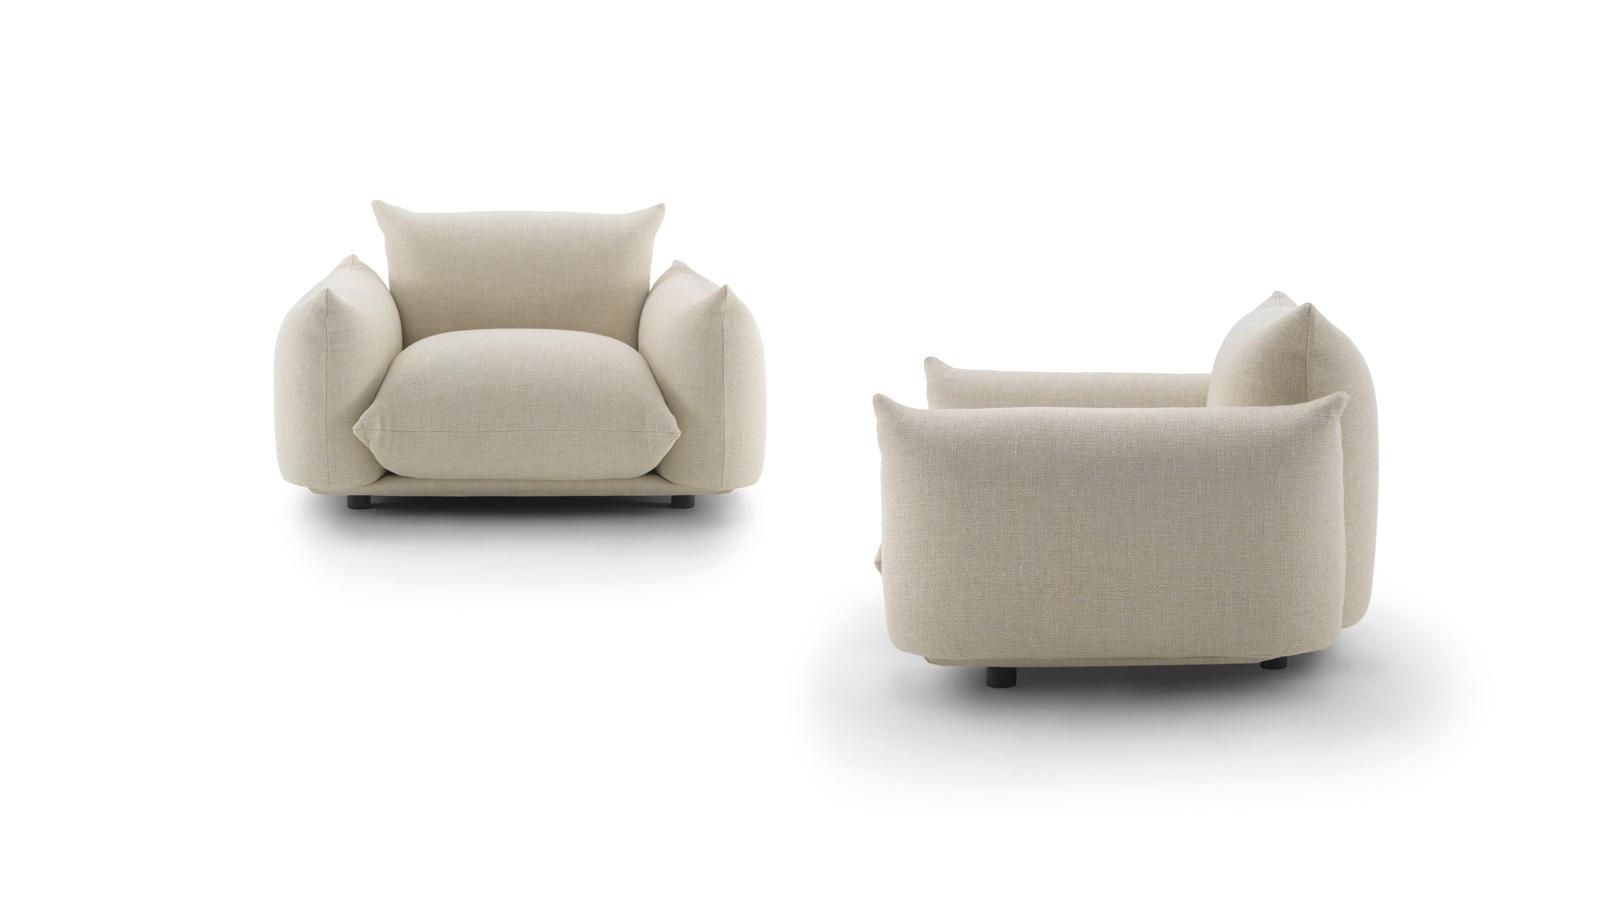 TinnappelMetz-arflex-marenco-sofa-05